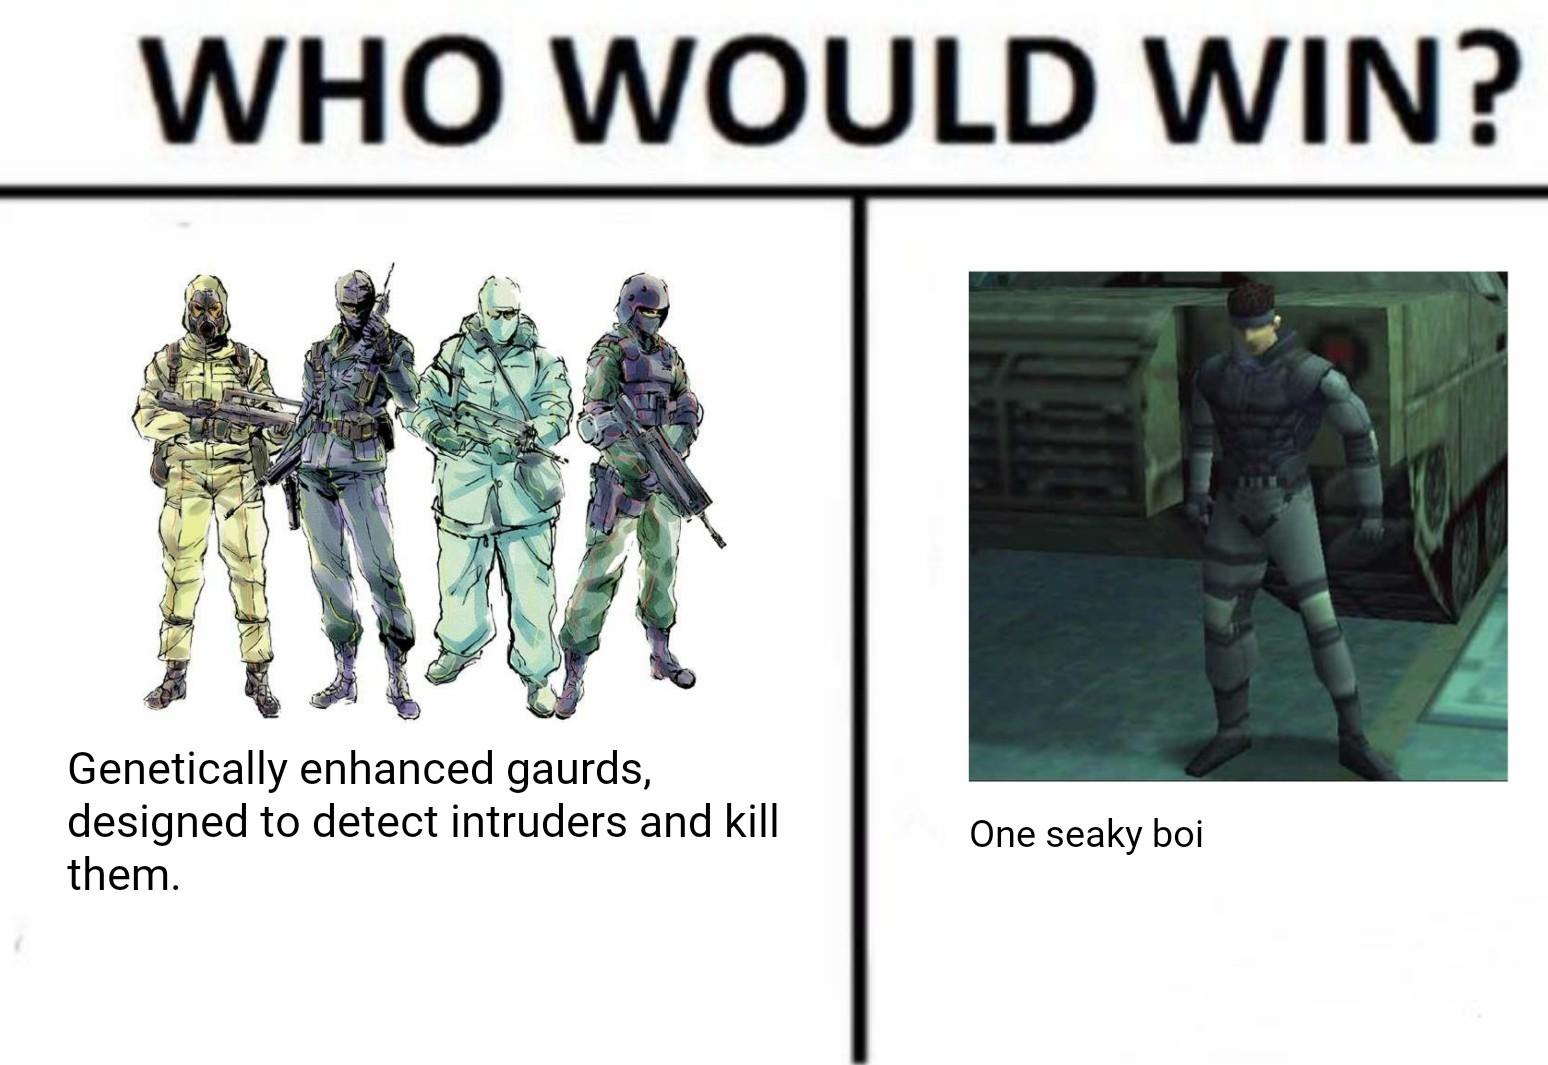 My second choice was a sneky boi - meme